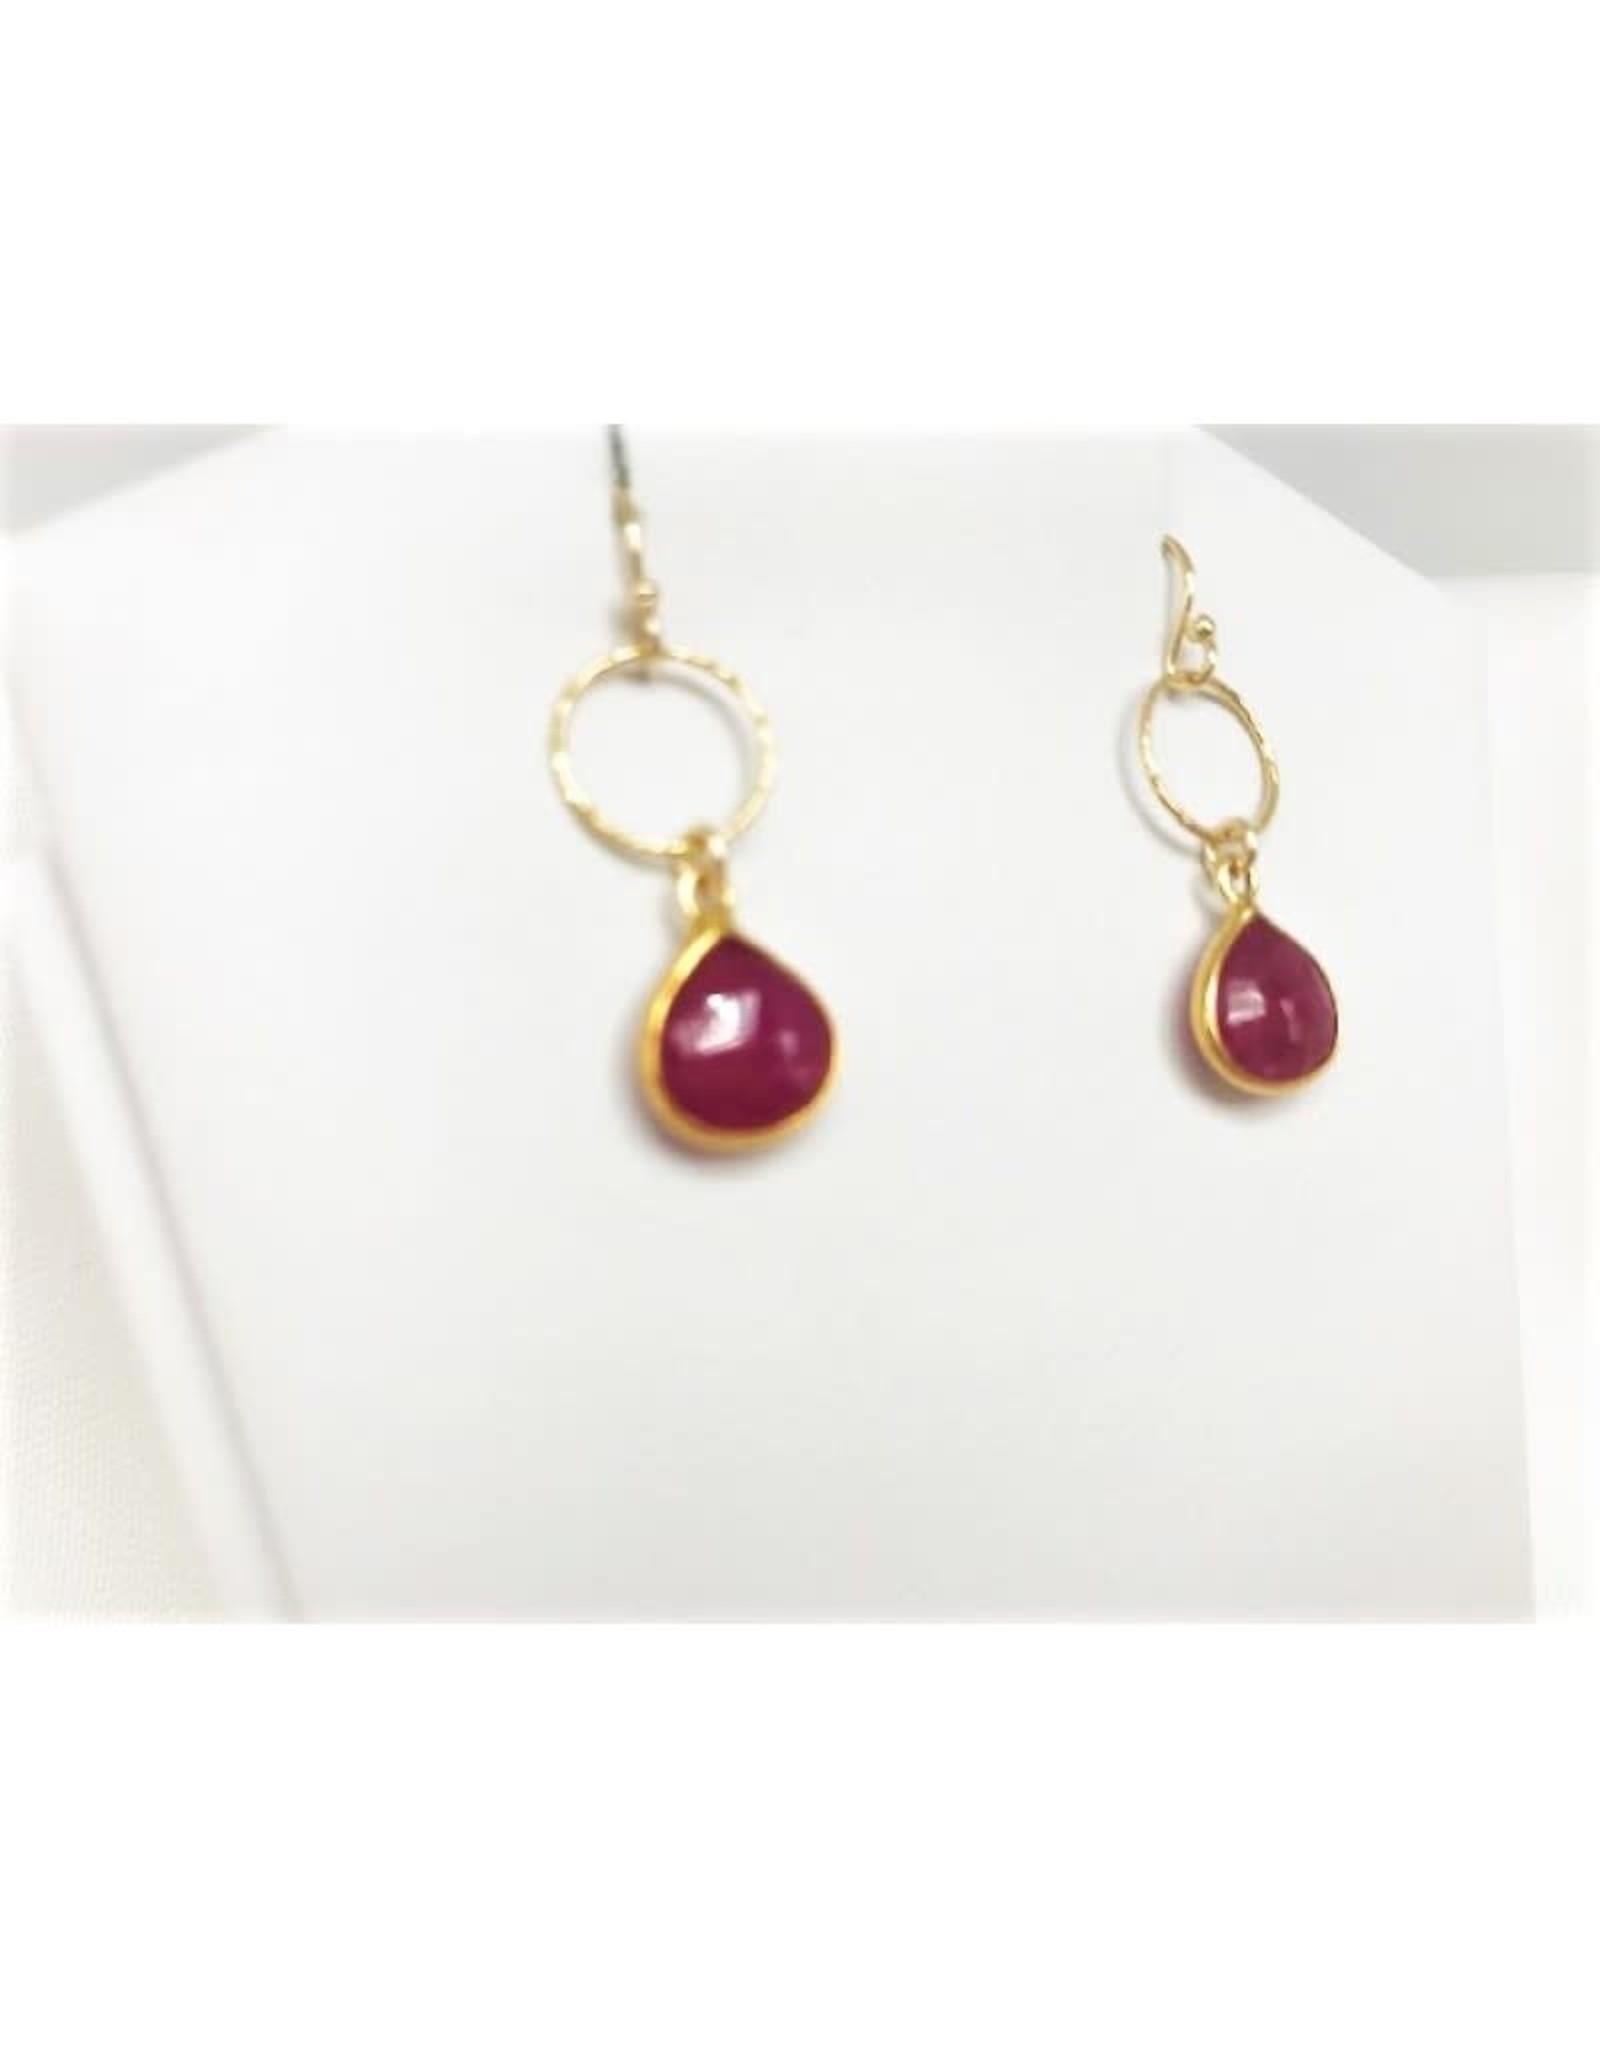 Dangle Earrings - Ruby/Gold/Sm Circle